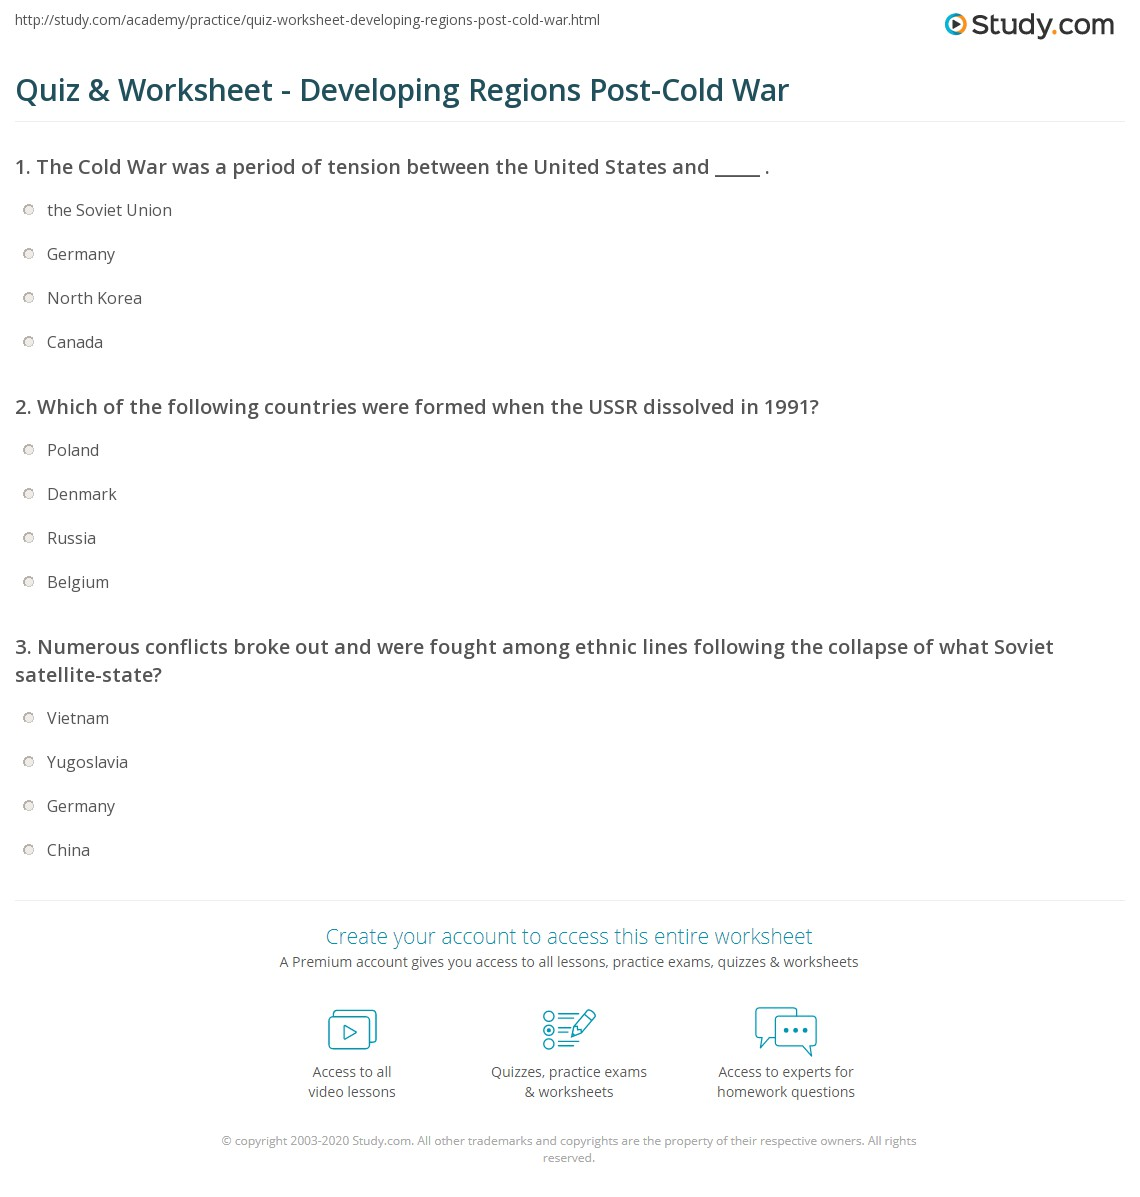 quiz worksheet developing regions post cold war study com rh study com Cold War 5th Grade Study Guide Cold War Study Notes